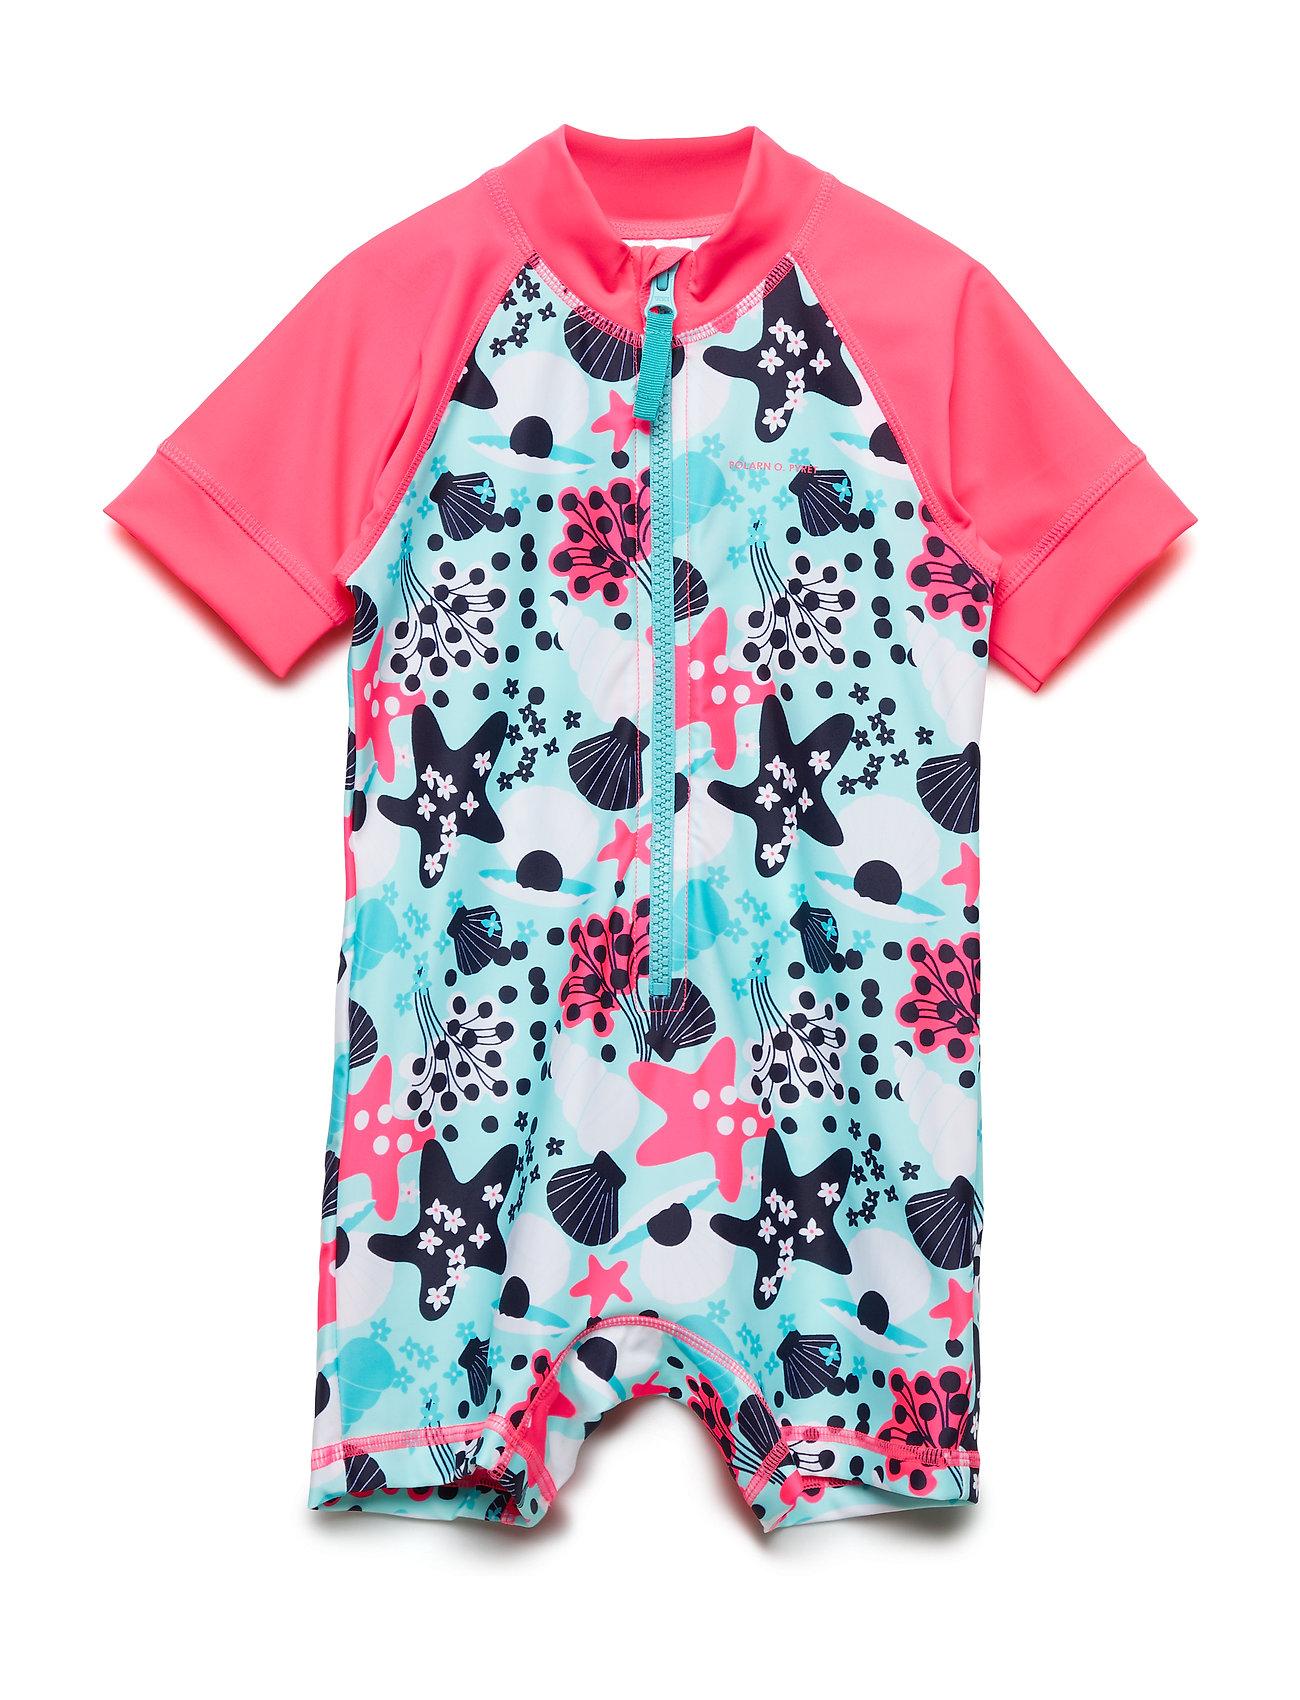 Polarn O. Pyret Swimsuit Short UPF AOP Preschool - FANDANGO PINK